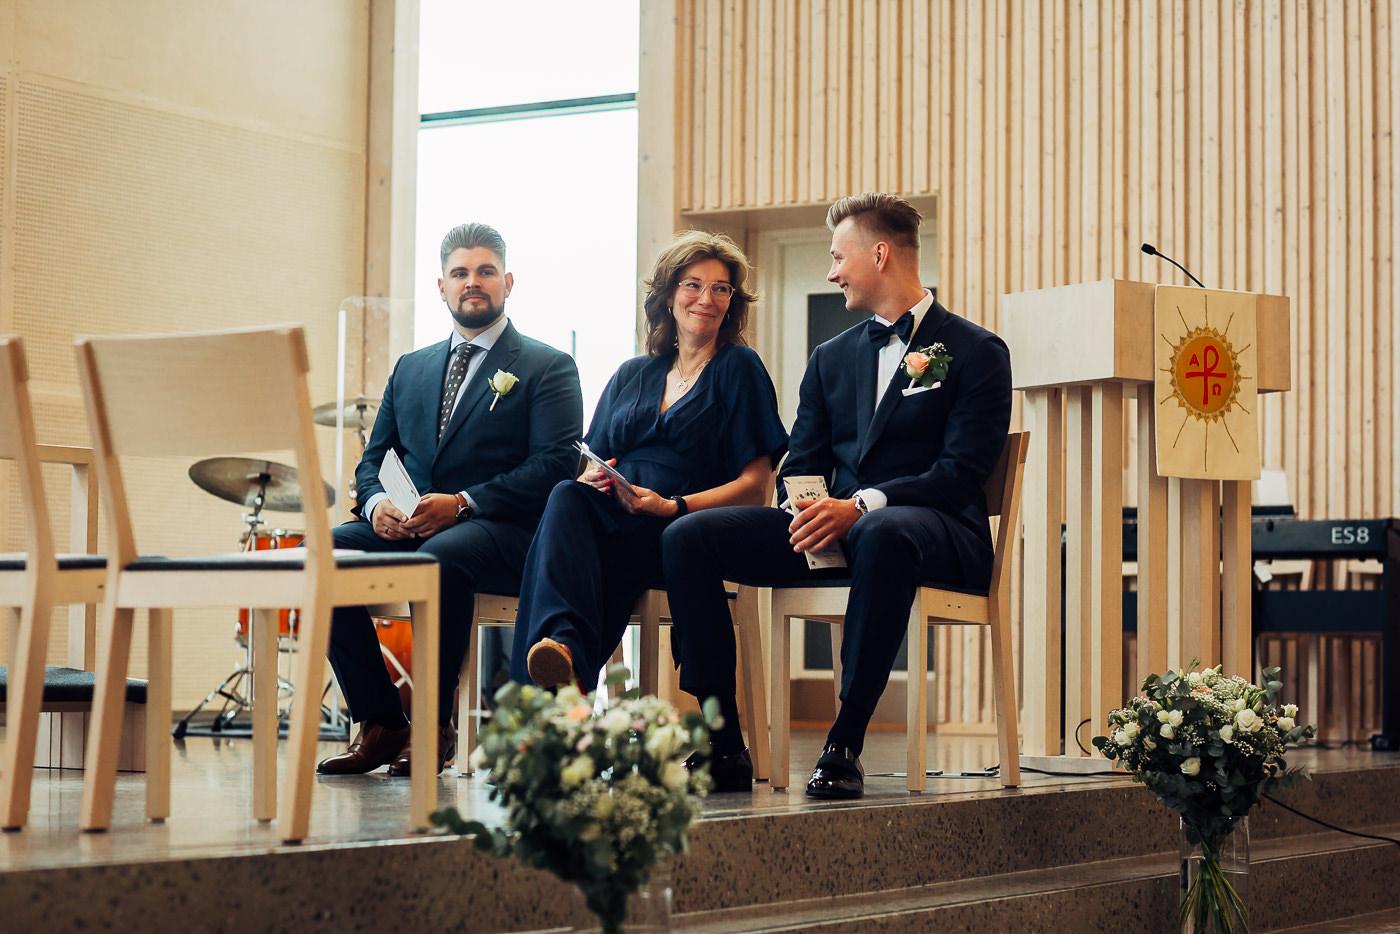 Ida Nathalie & Sebastian  - vakkert junibryllup i Lillestrøm Bryllupsfotograf Hellerud Akershus 30